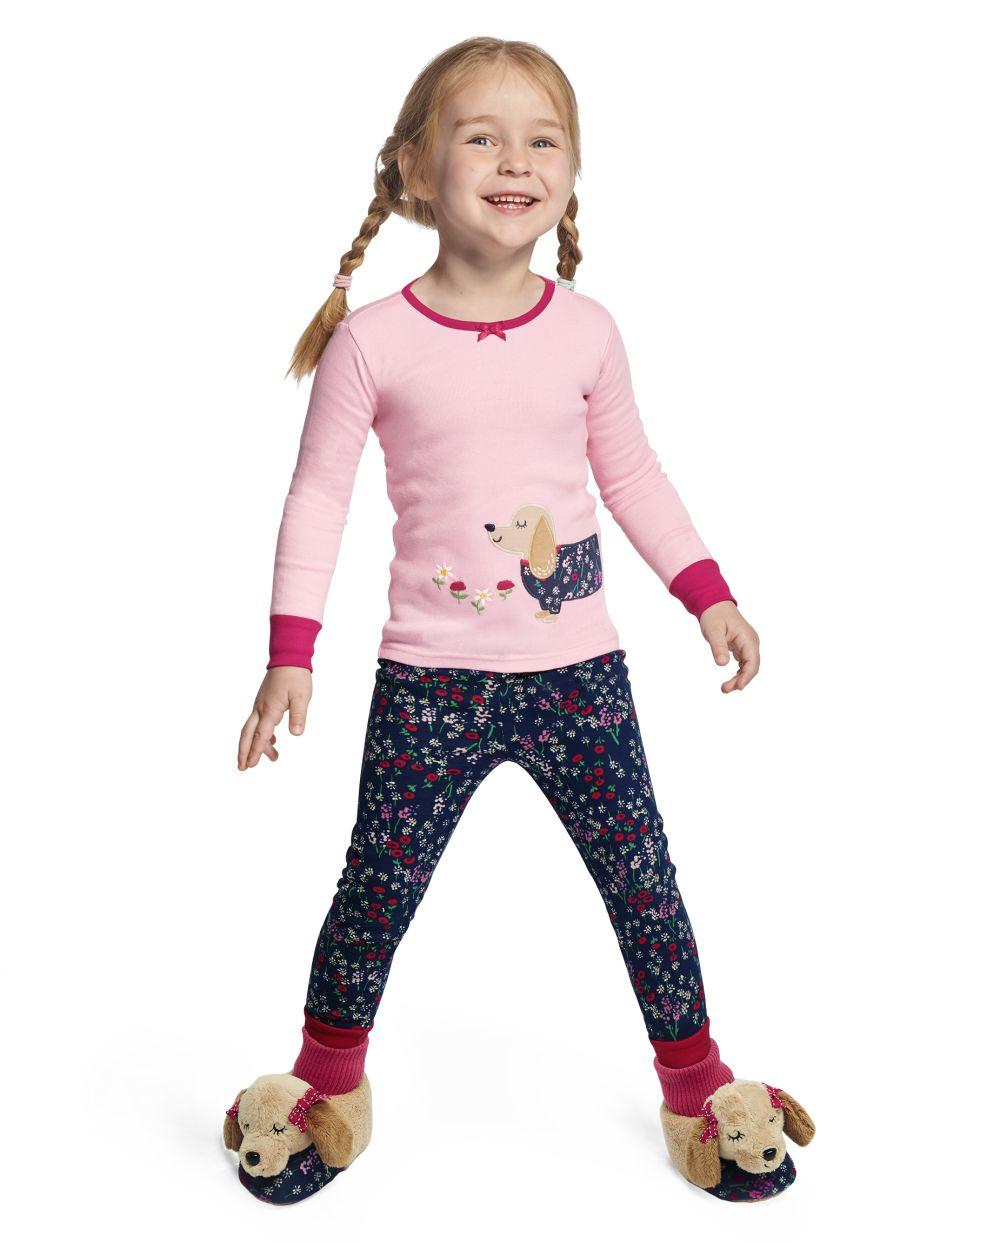 Girls Preppy Puppy Cotton 2-Piece Pajamas - Gymmies